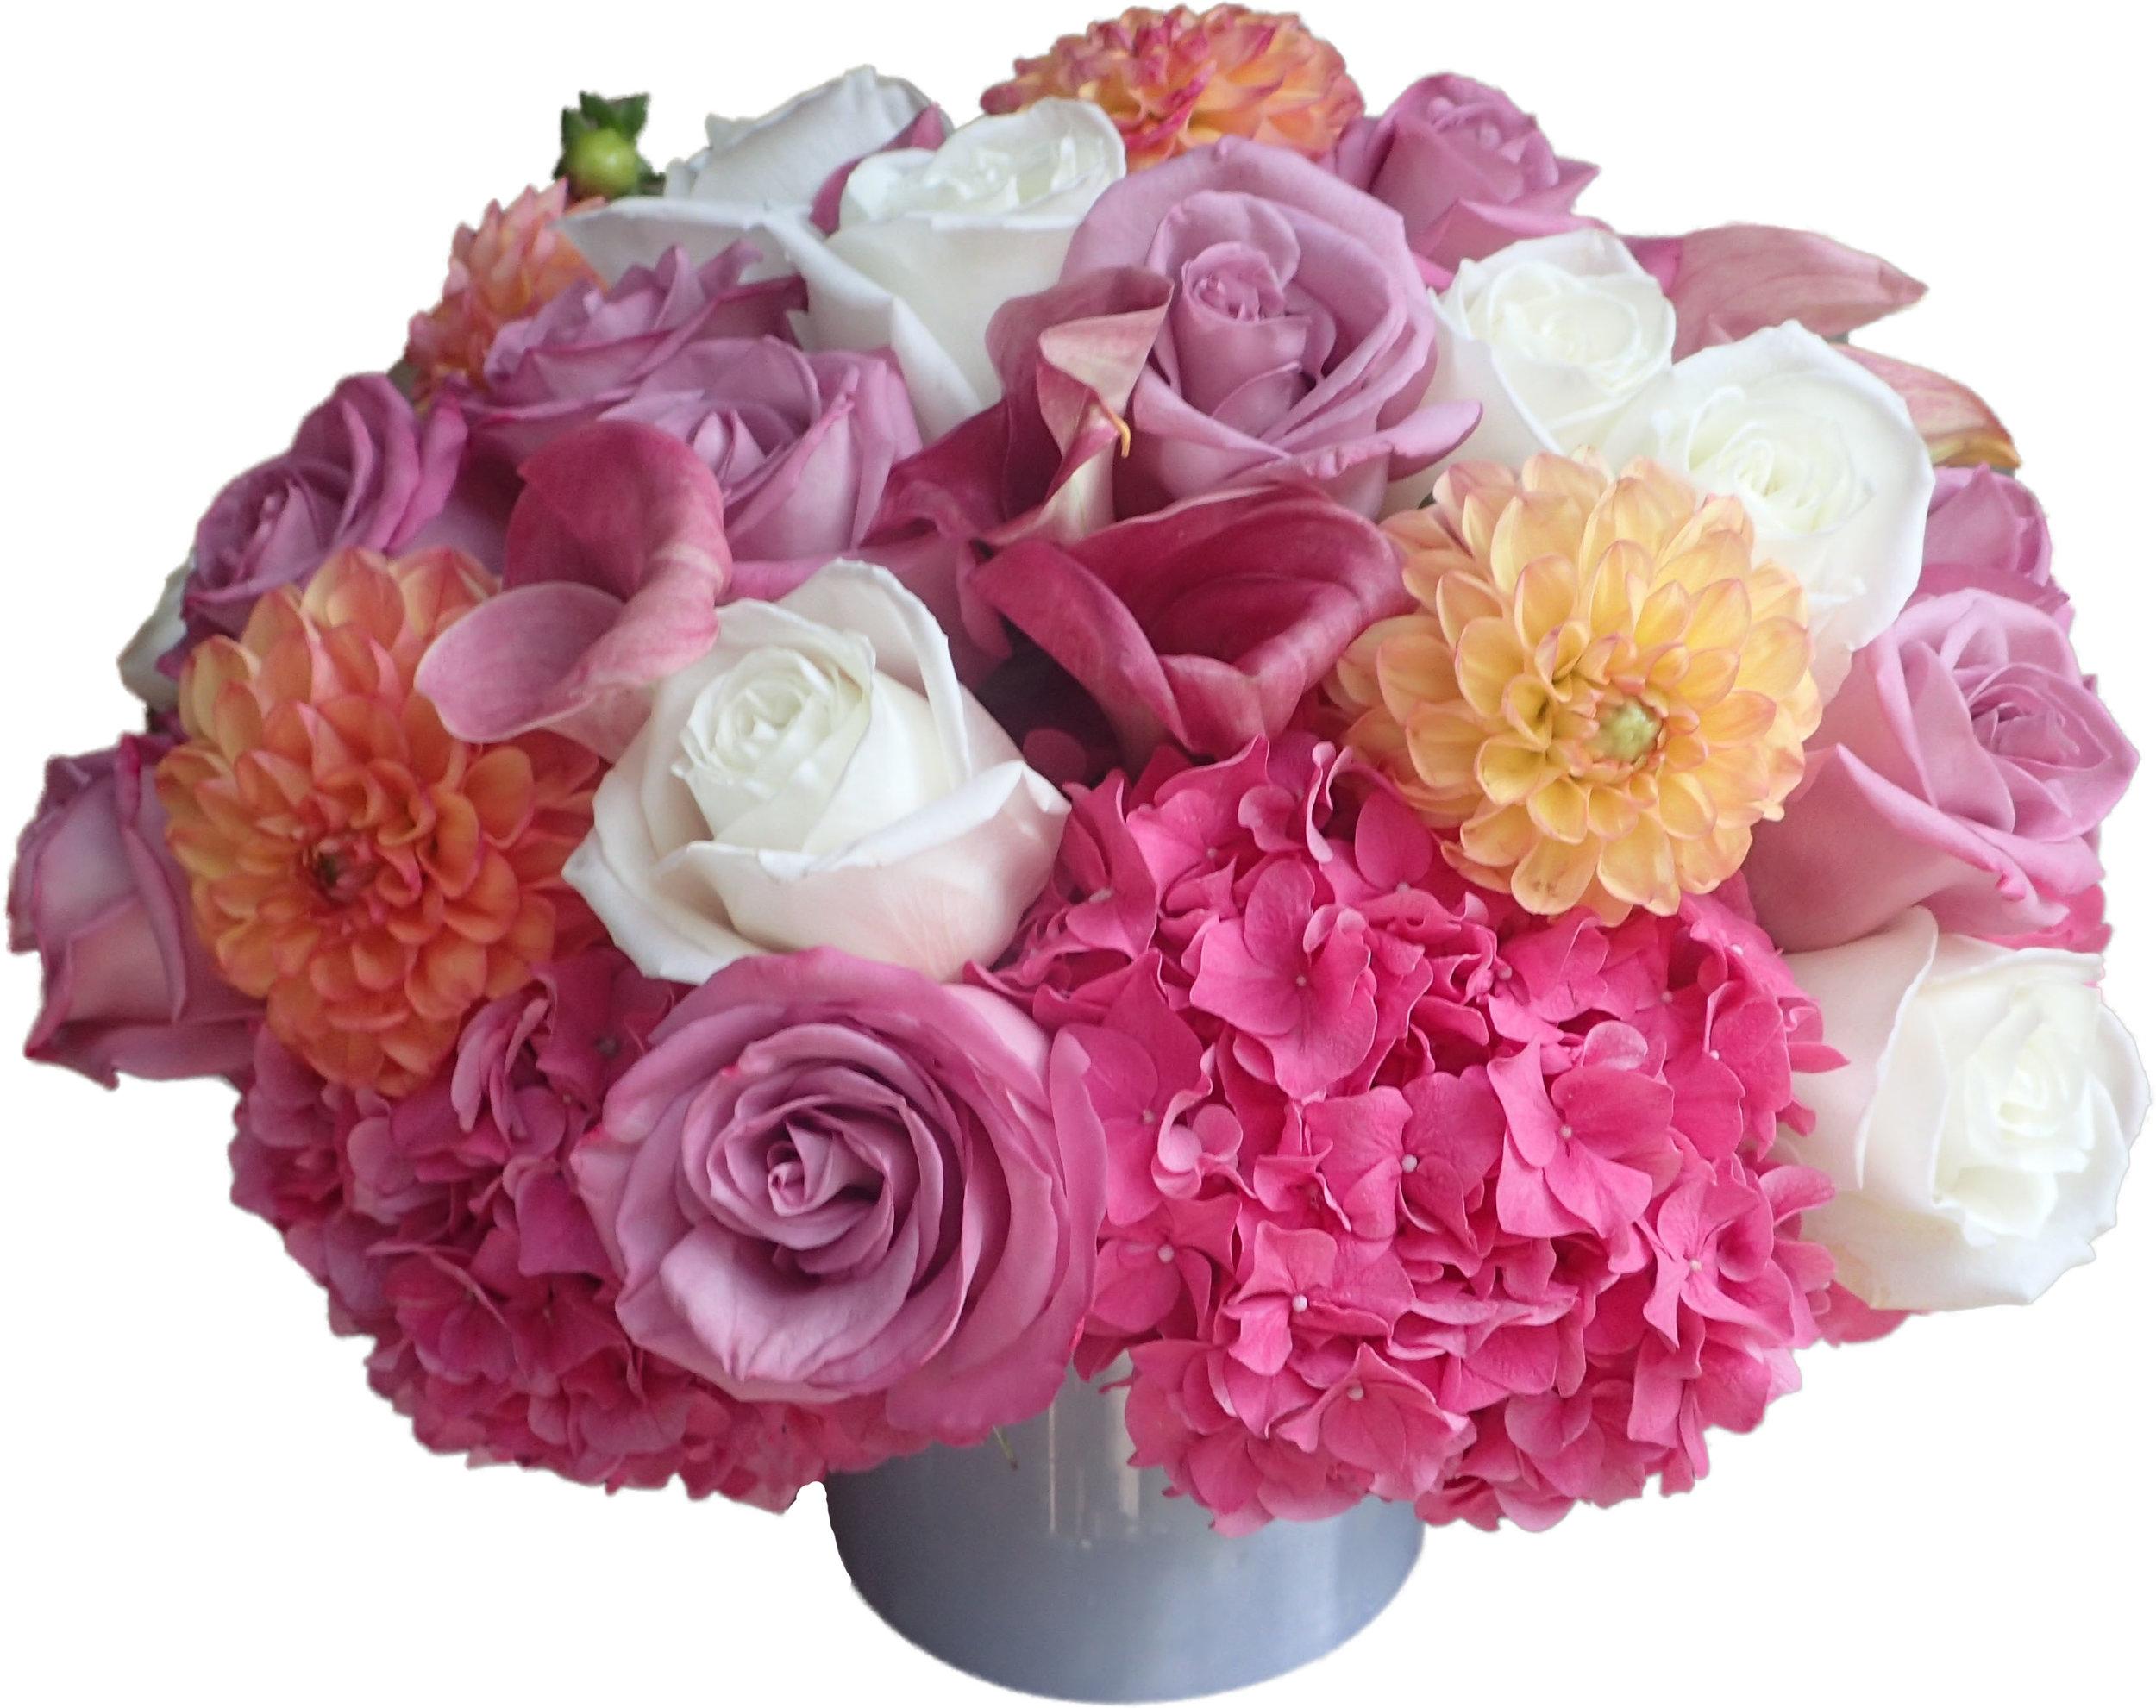 Pastel Rose, Dahlia, Hydrangea Mix starts at $250